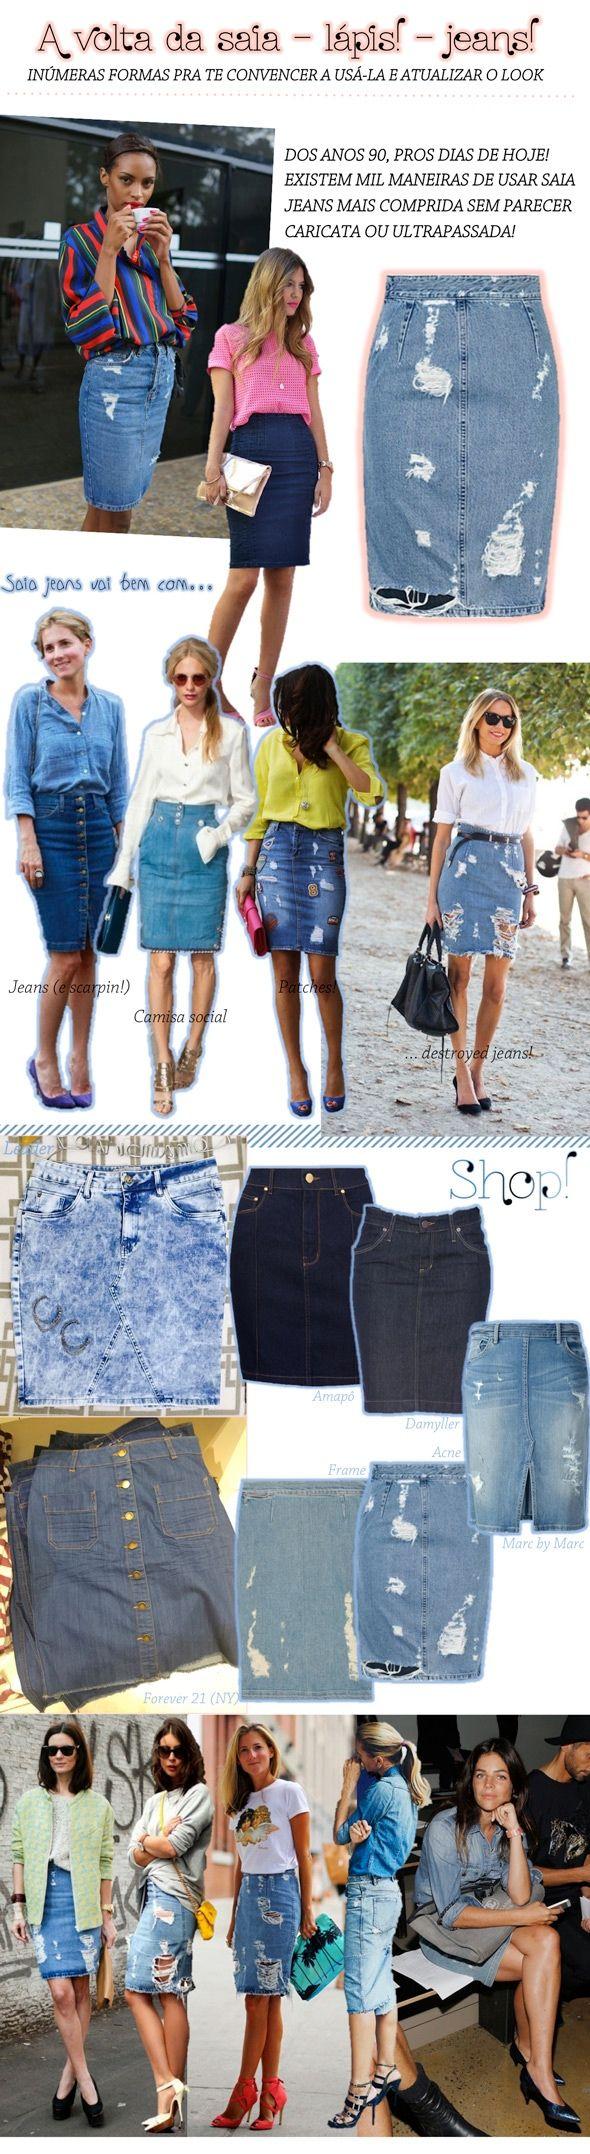 A saia – lápis – jeans da discórdia!